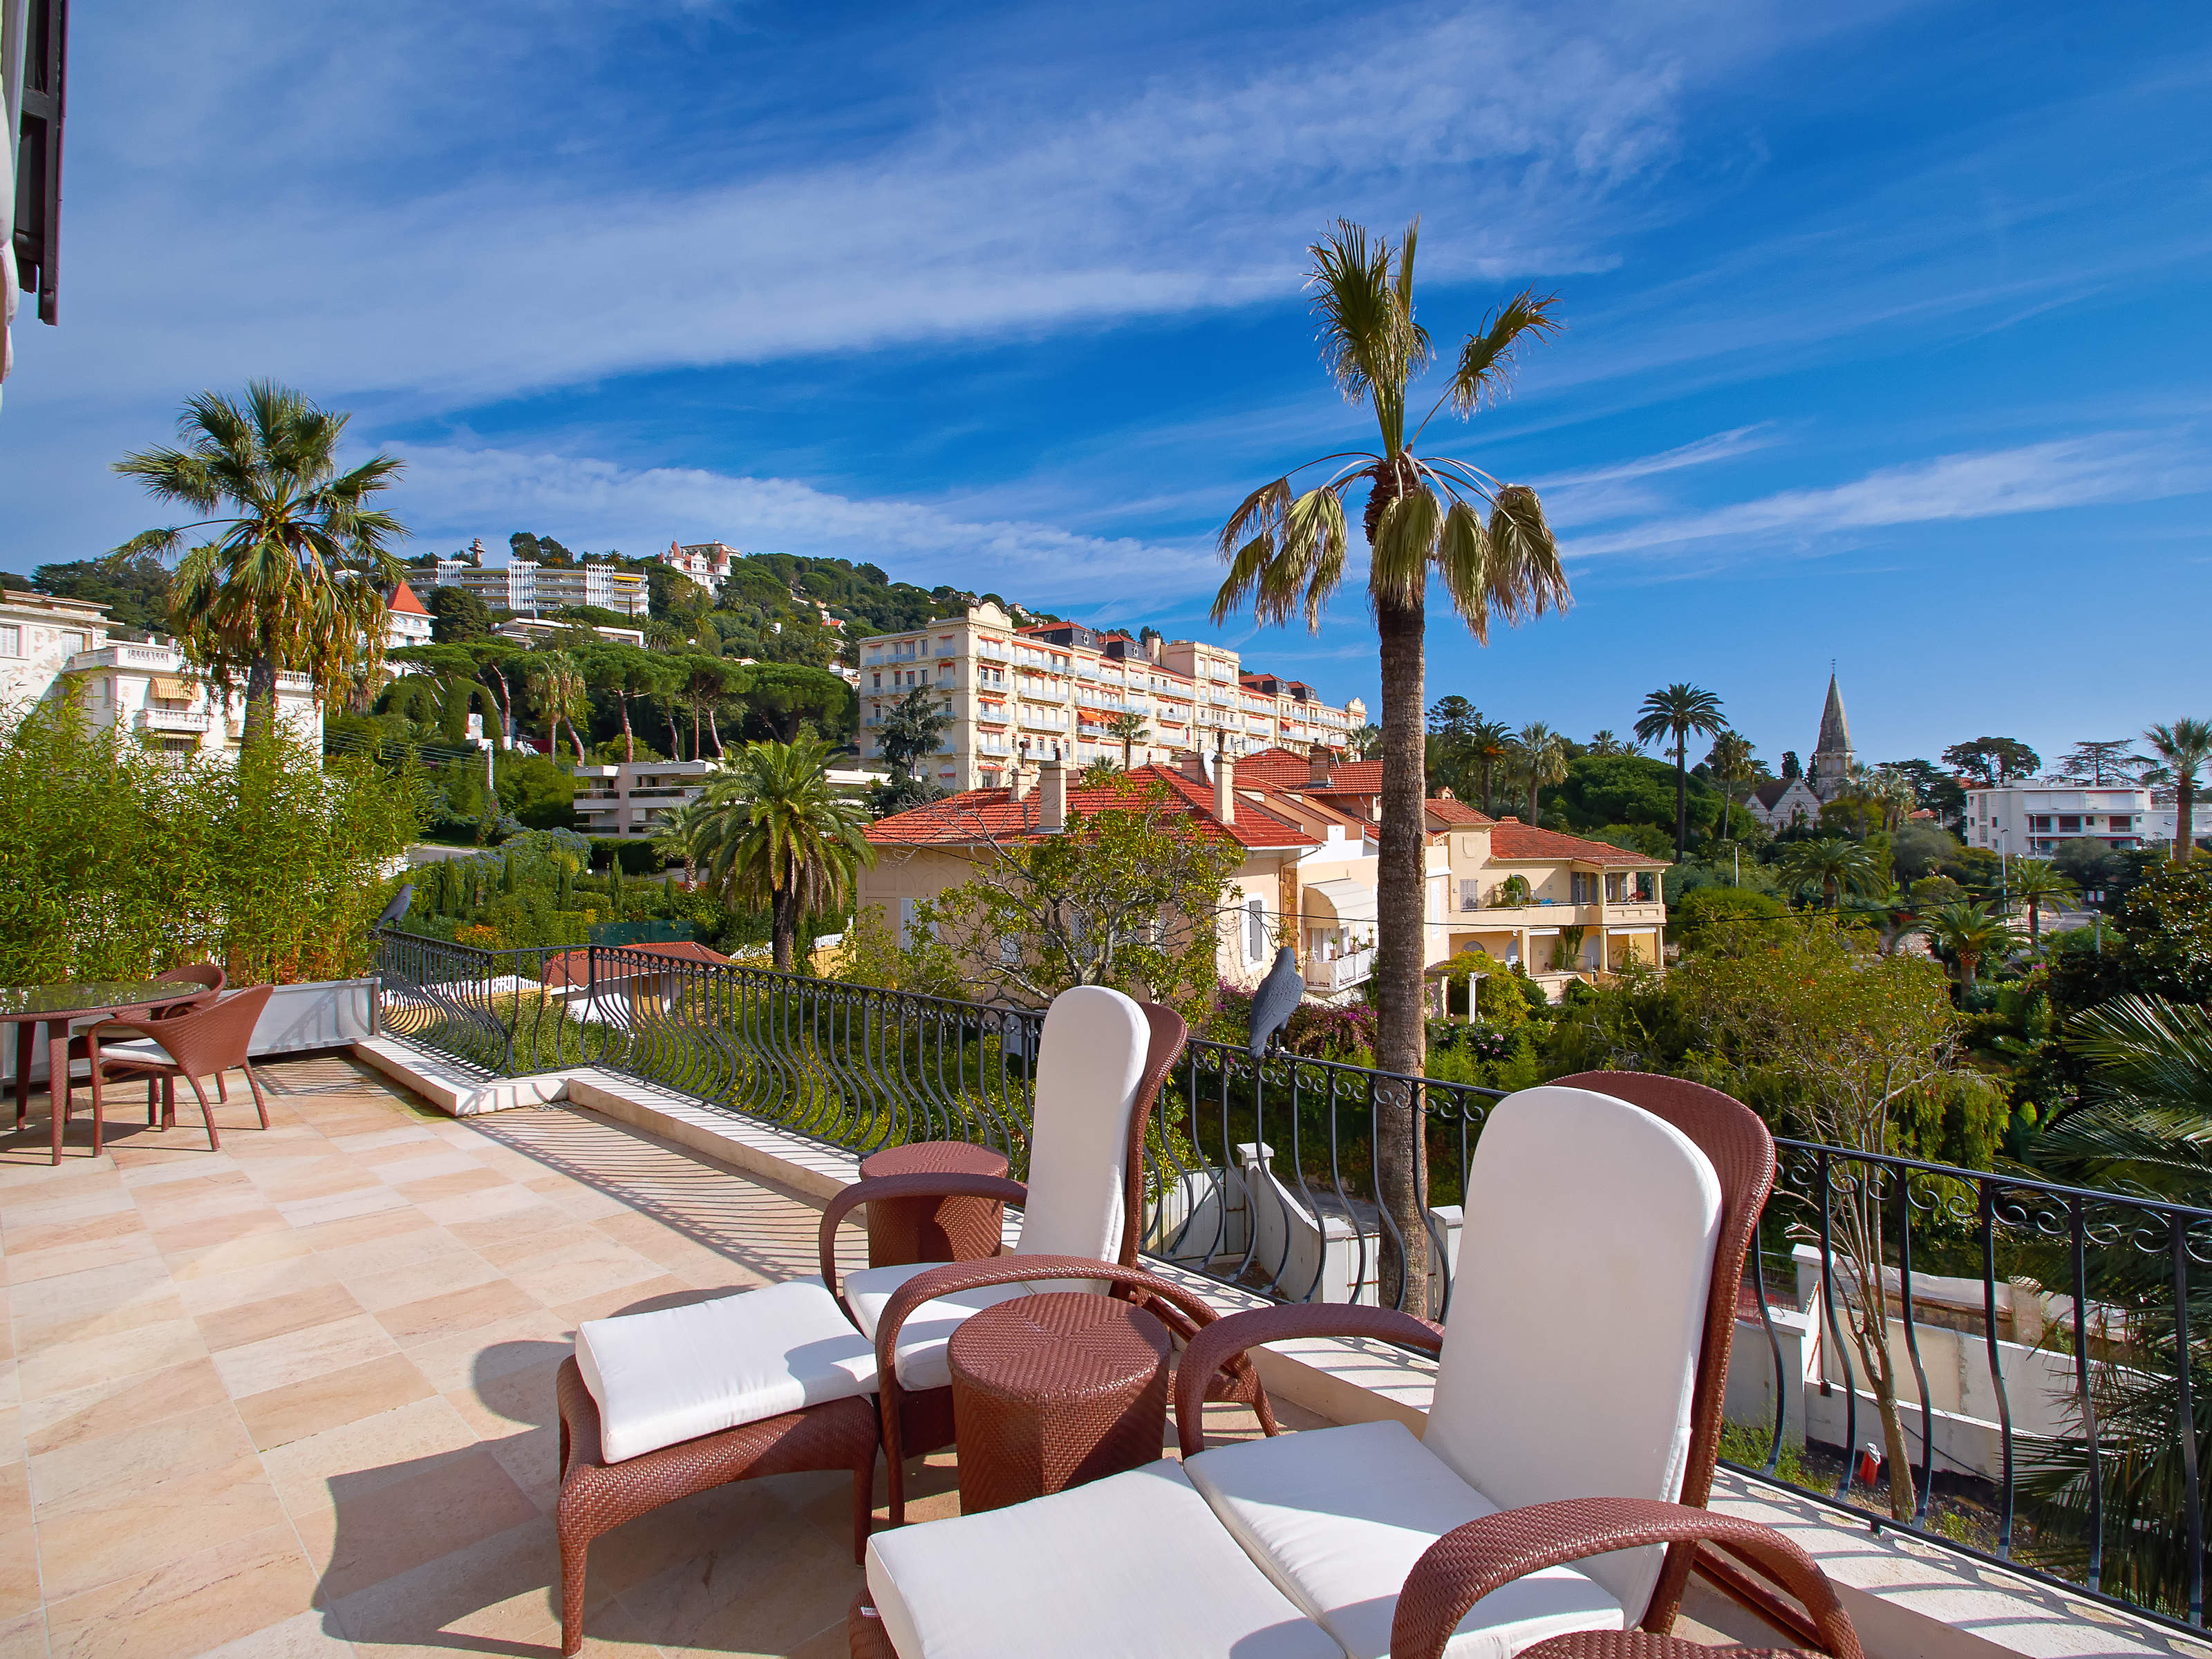 Apartamento para Venda às Bourgeois luxury apartment for sale in Cannes Californie Cannes, Provença-Alpes-Costa Azul 06400 França